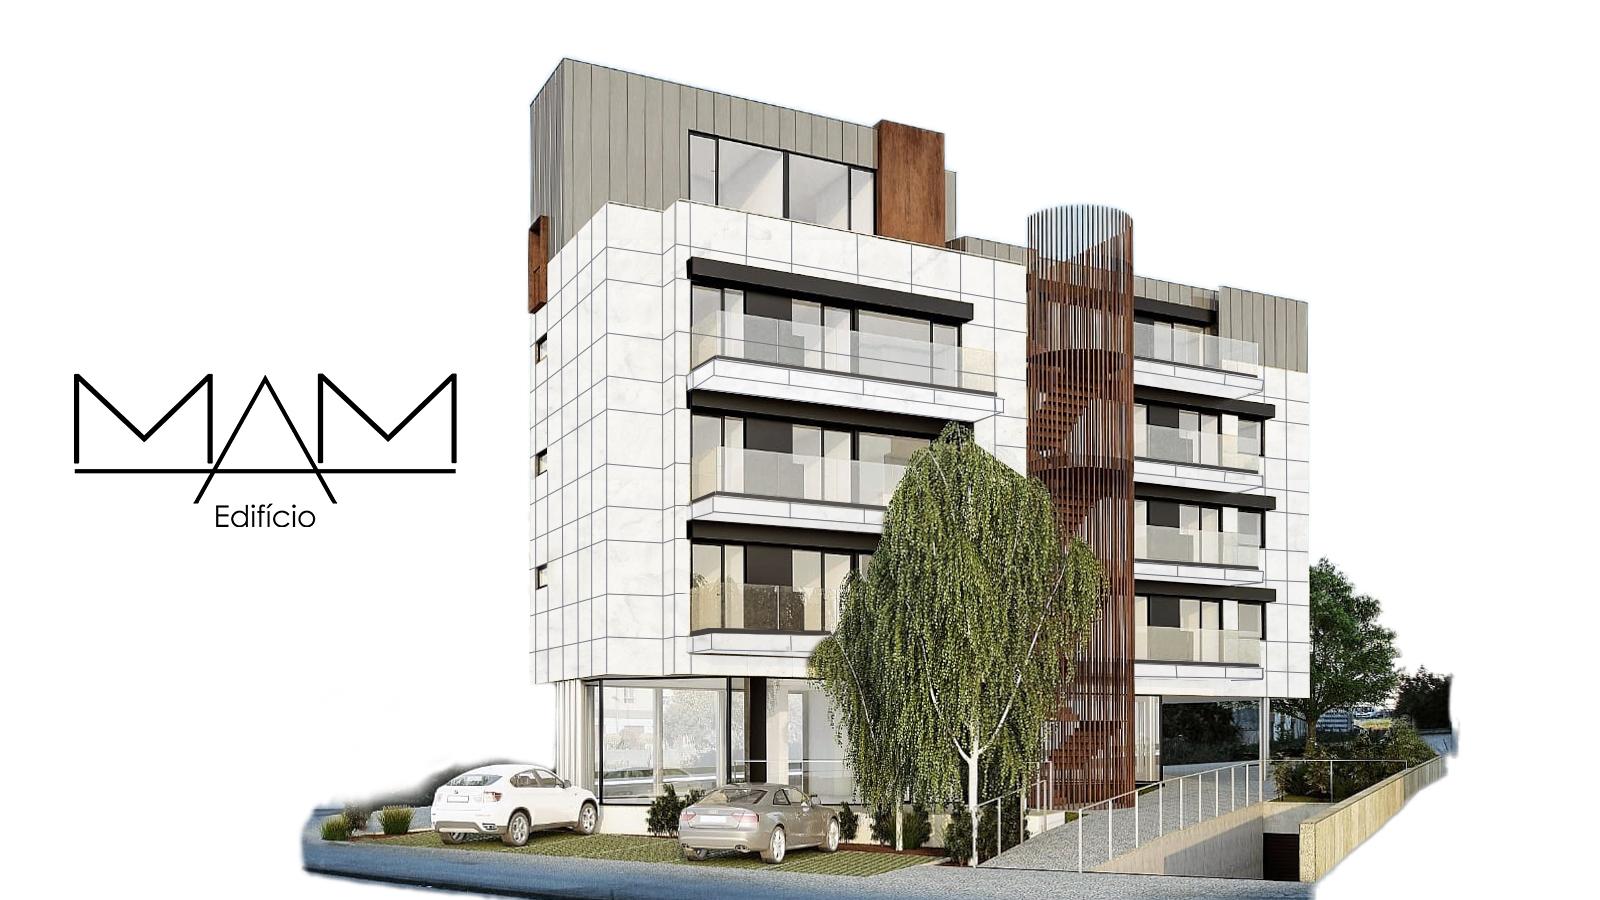 Edifício M.A.M.